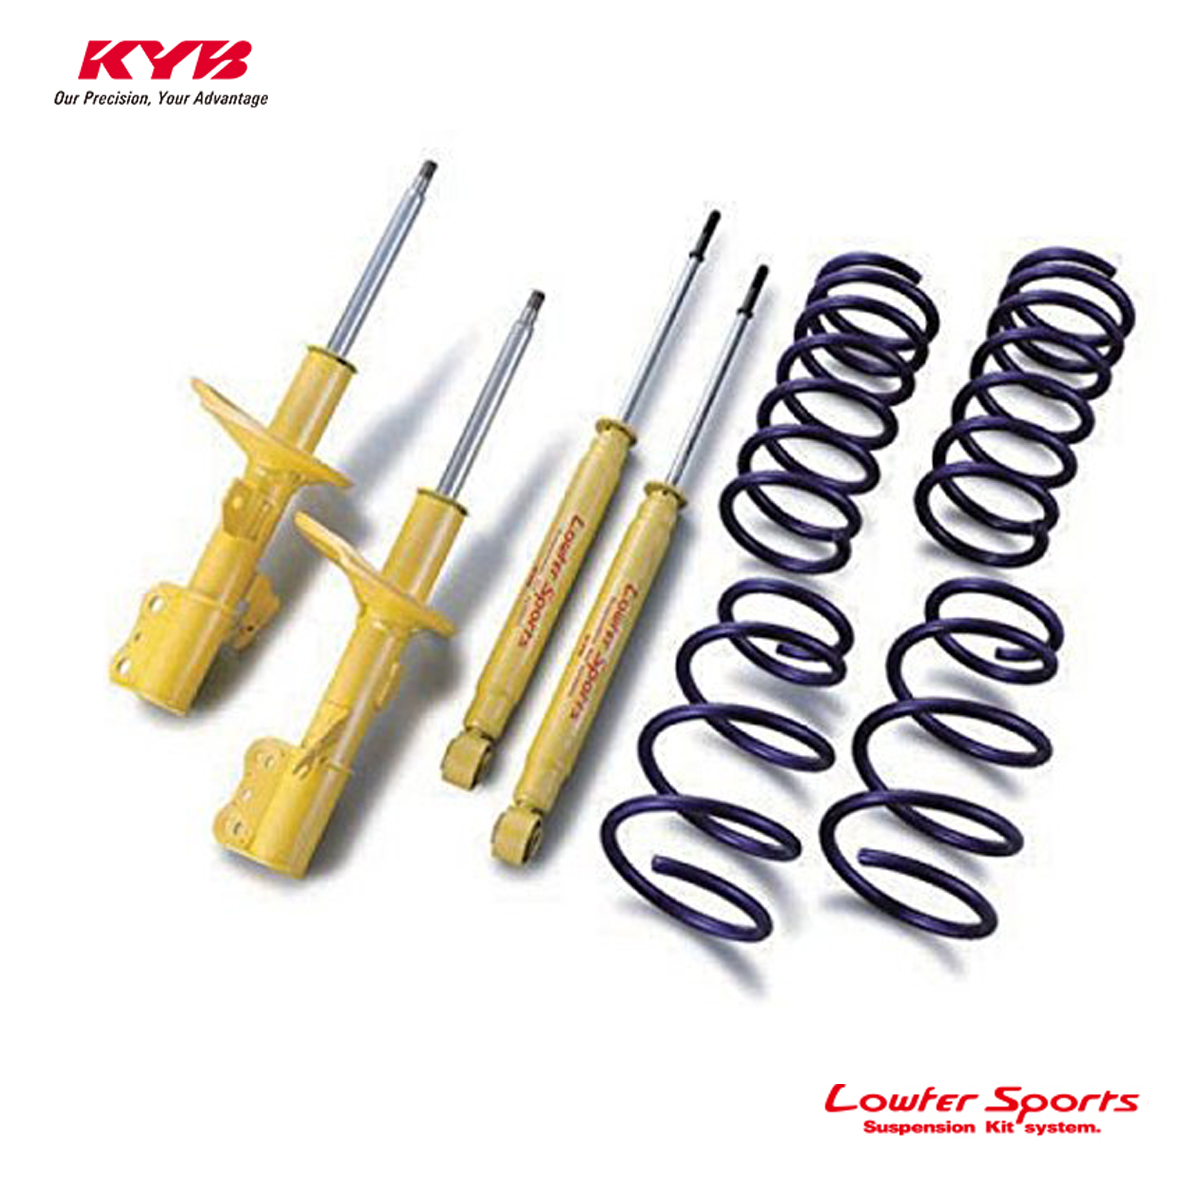 KYB カヤバ アクセラスポーツ BM5FS ショックアブソーバー サスペンションキット 1台分 ローファースポーツ キット Lowfer Sports LKIT-BM5FS